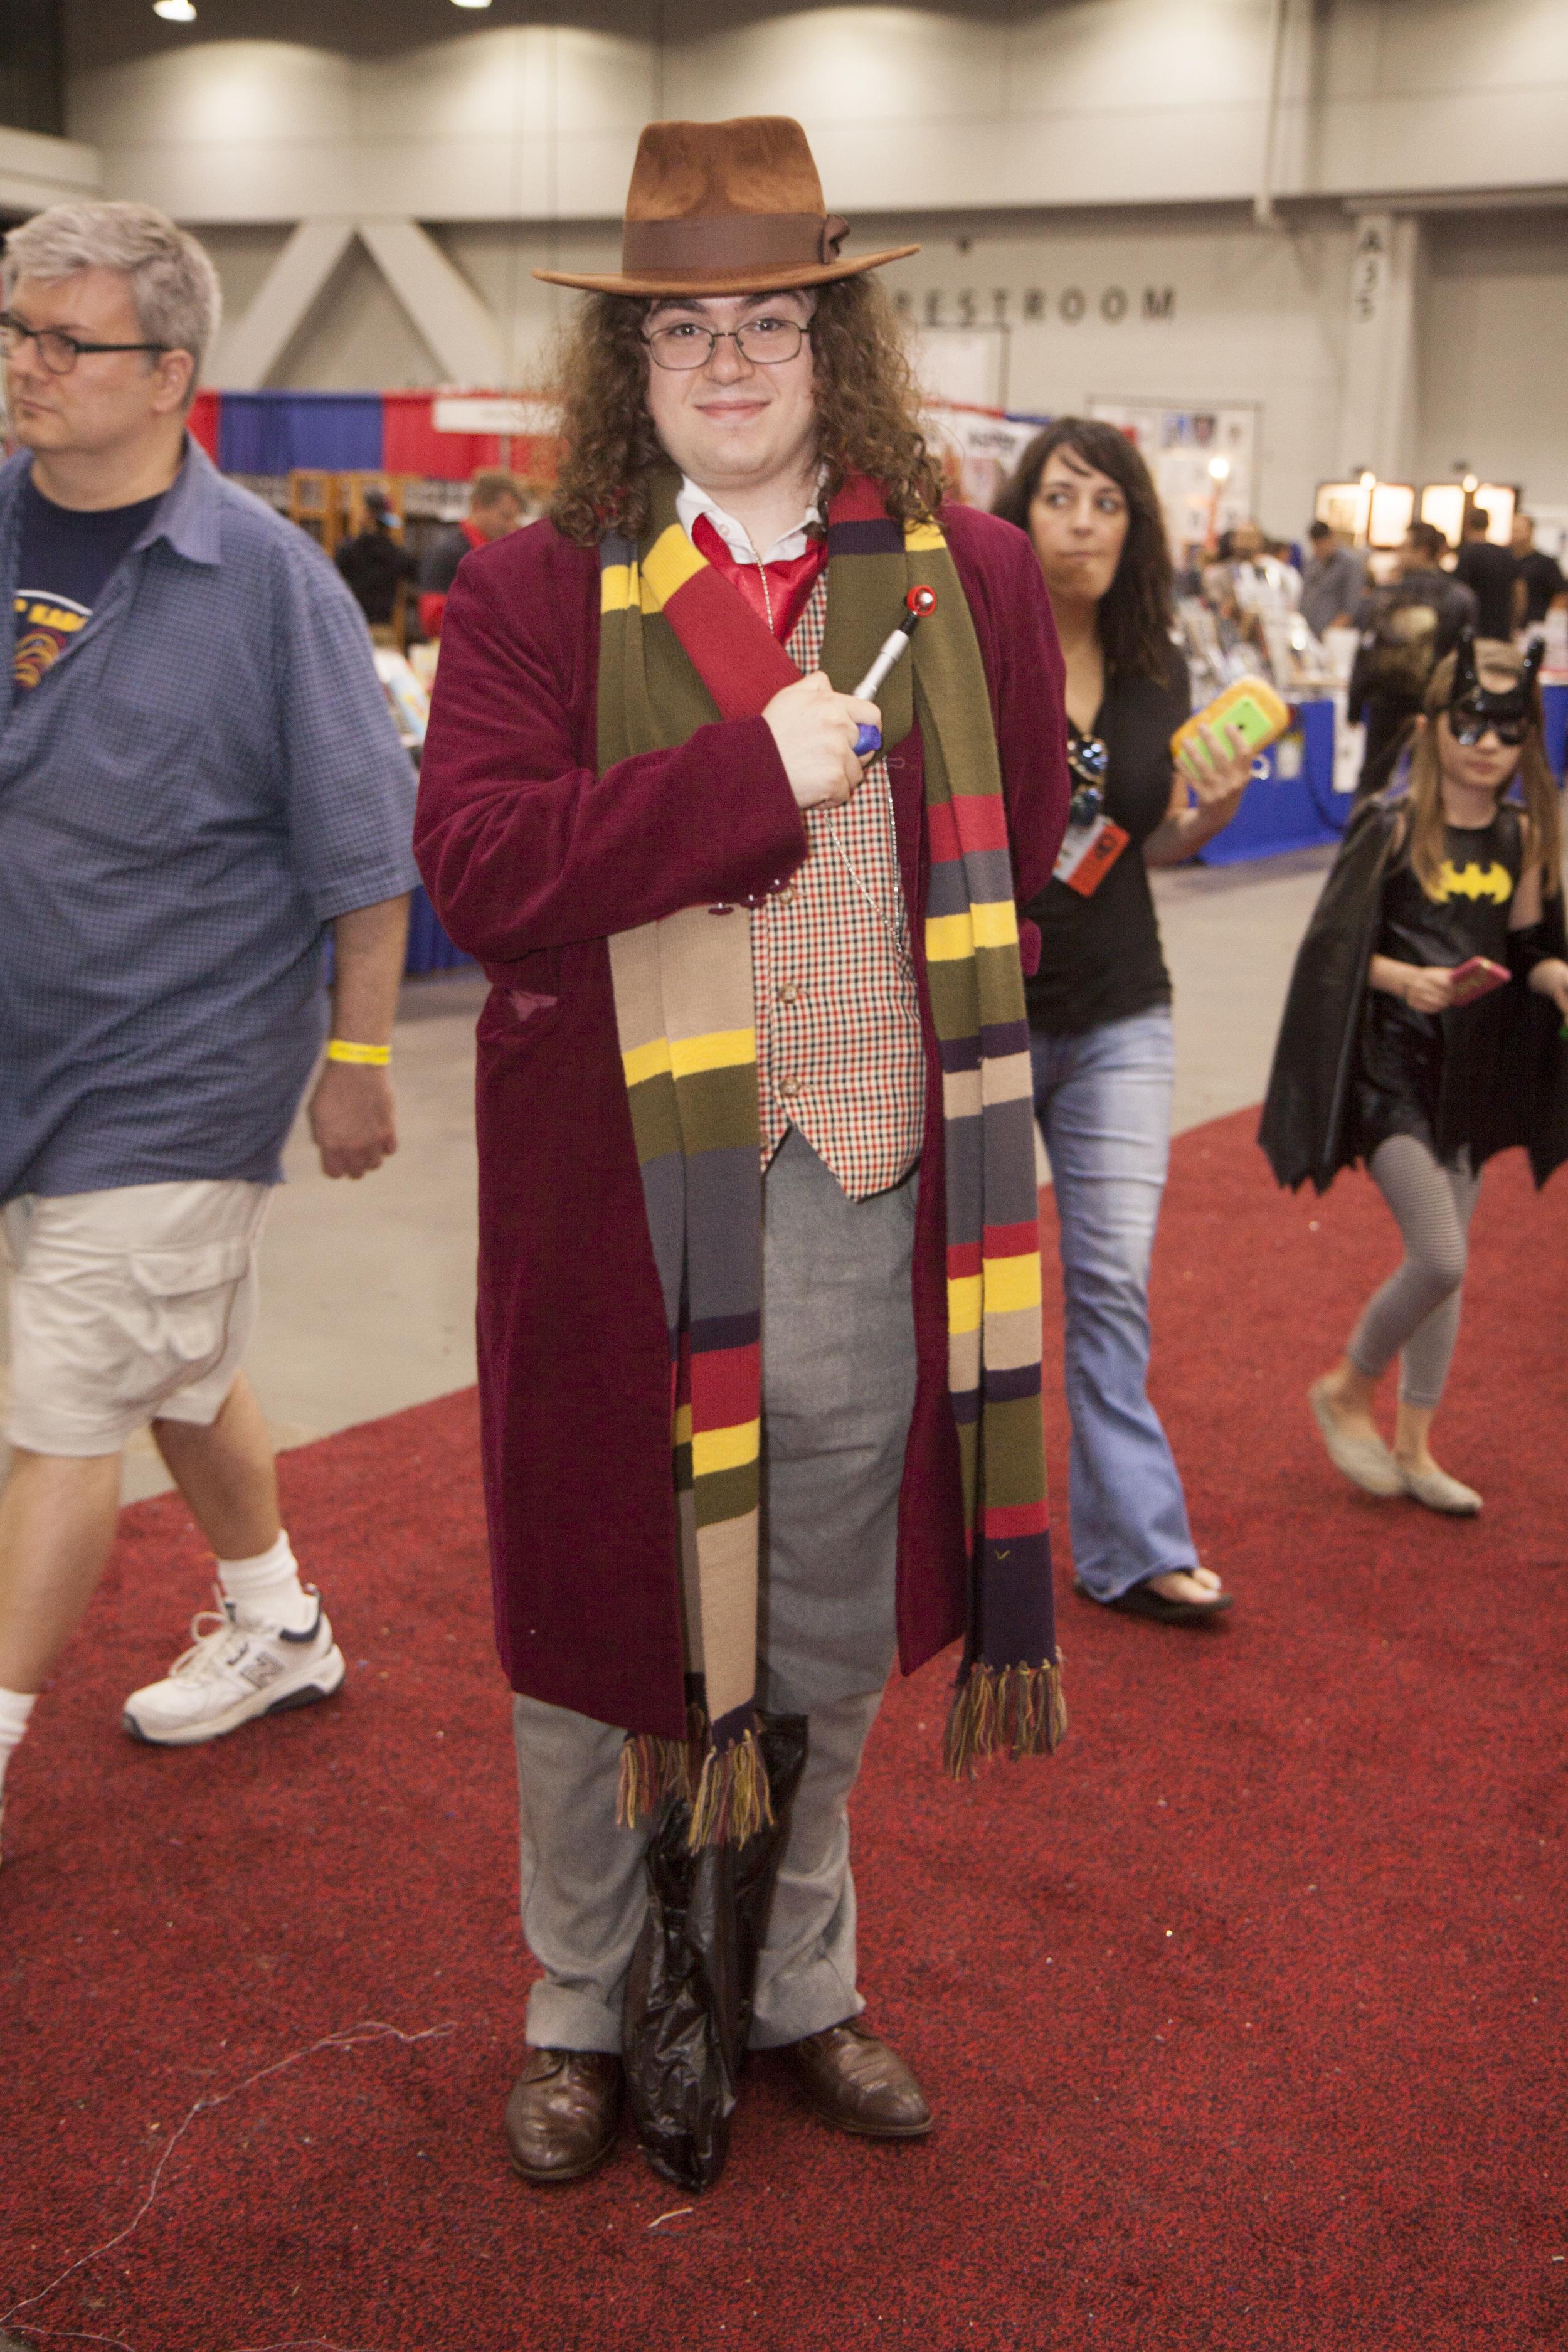 Cincinnati Comic Expo 2015 - Cosplay - 19.jpg